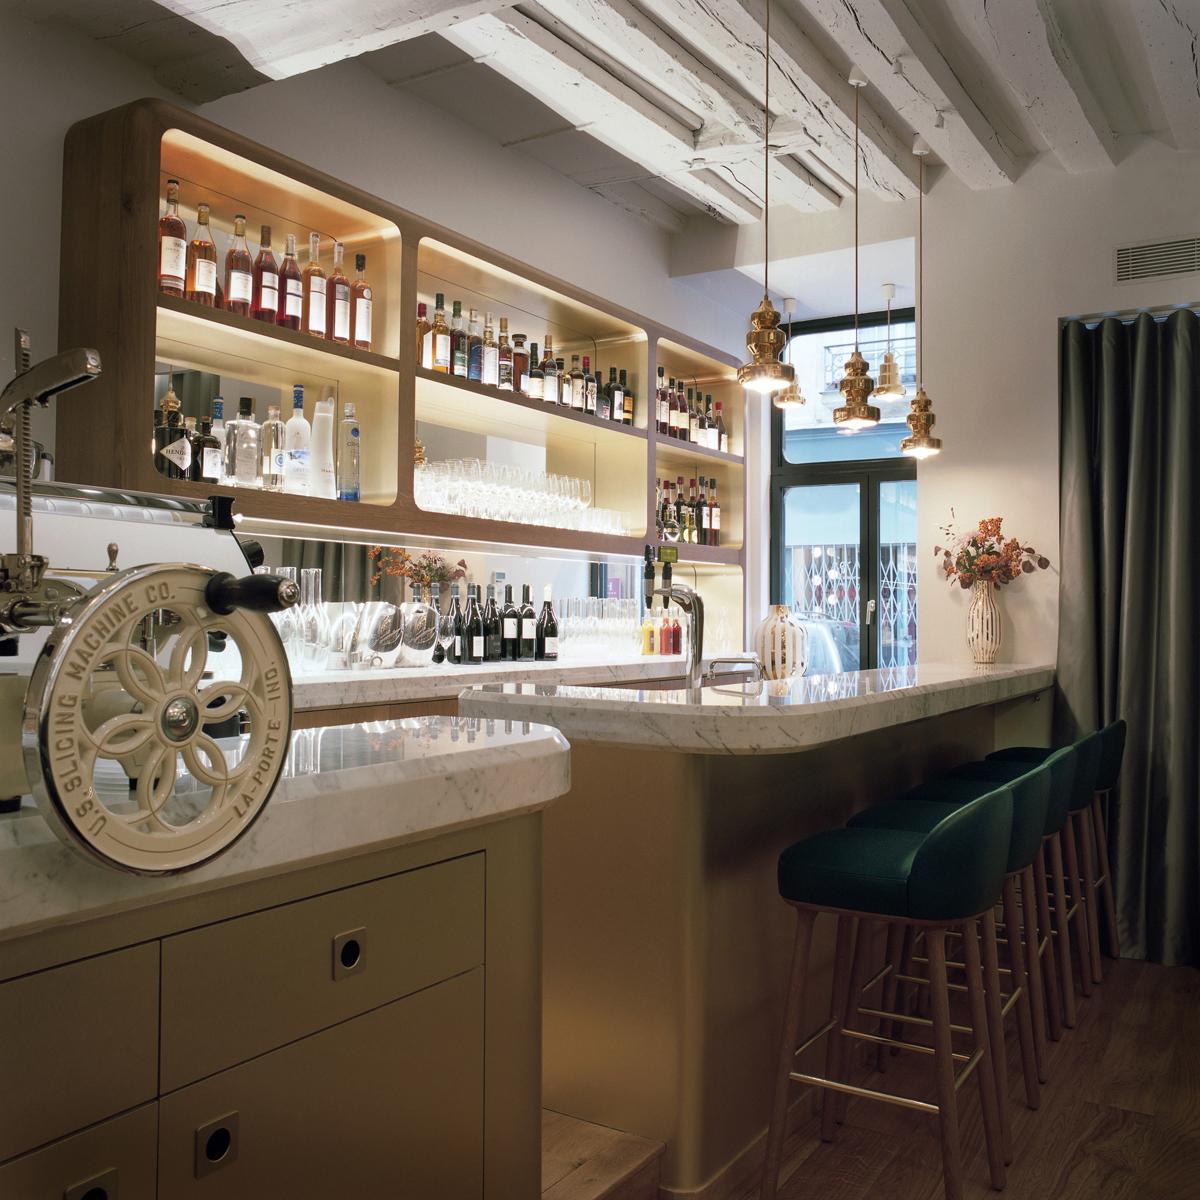 sergent-recruteur-jaime-hayon-restaurante-paris-nextdeco-decoracion-gourmet.jpg